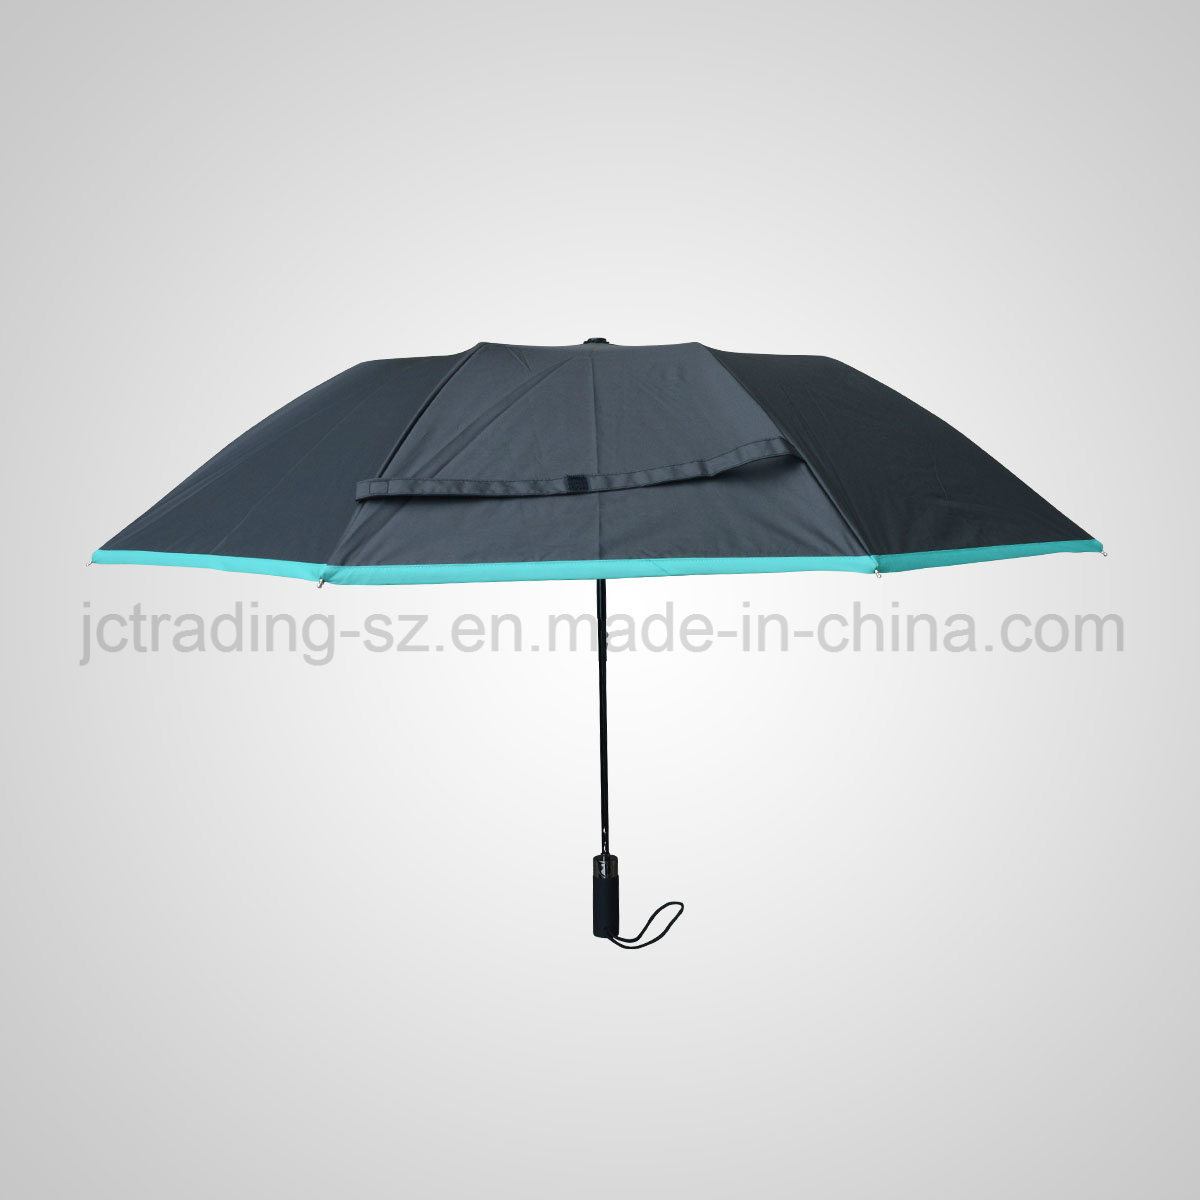 2 Section Automaic Folding Umbrella Rain & Sun Parasol (JF-ABZ201)